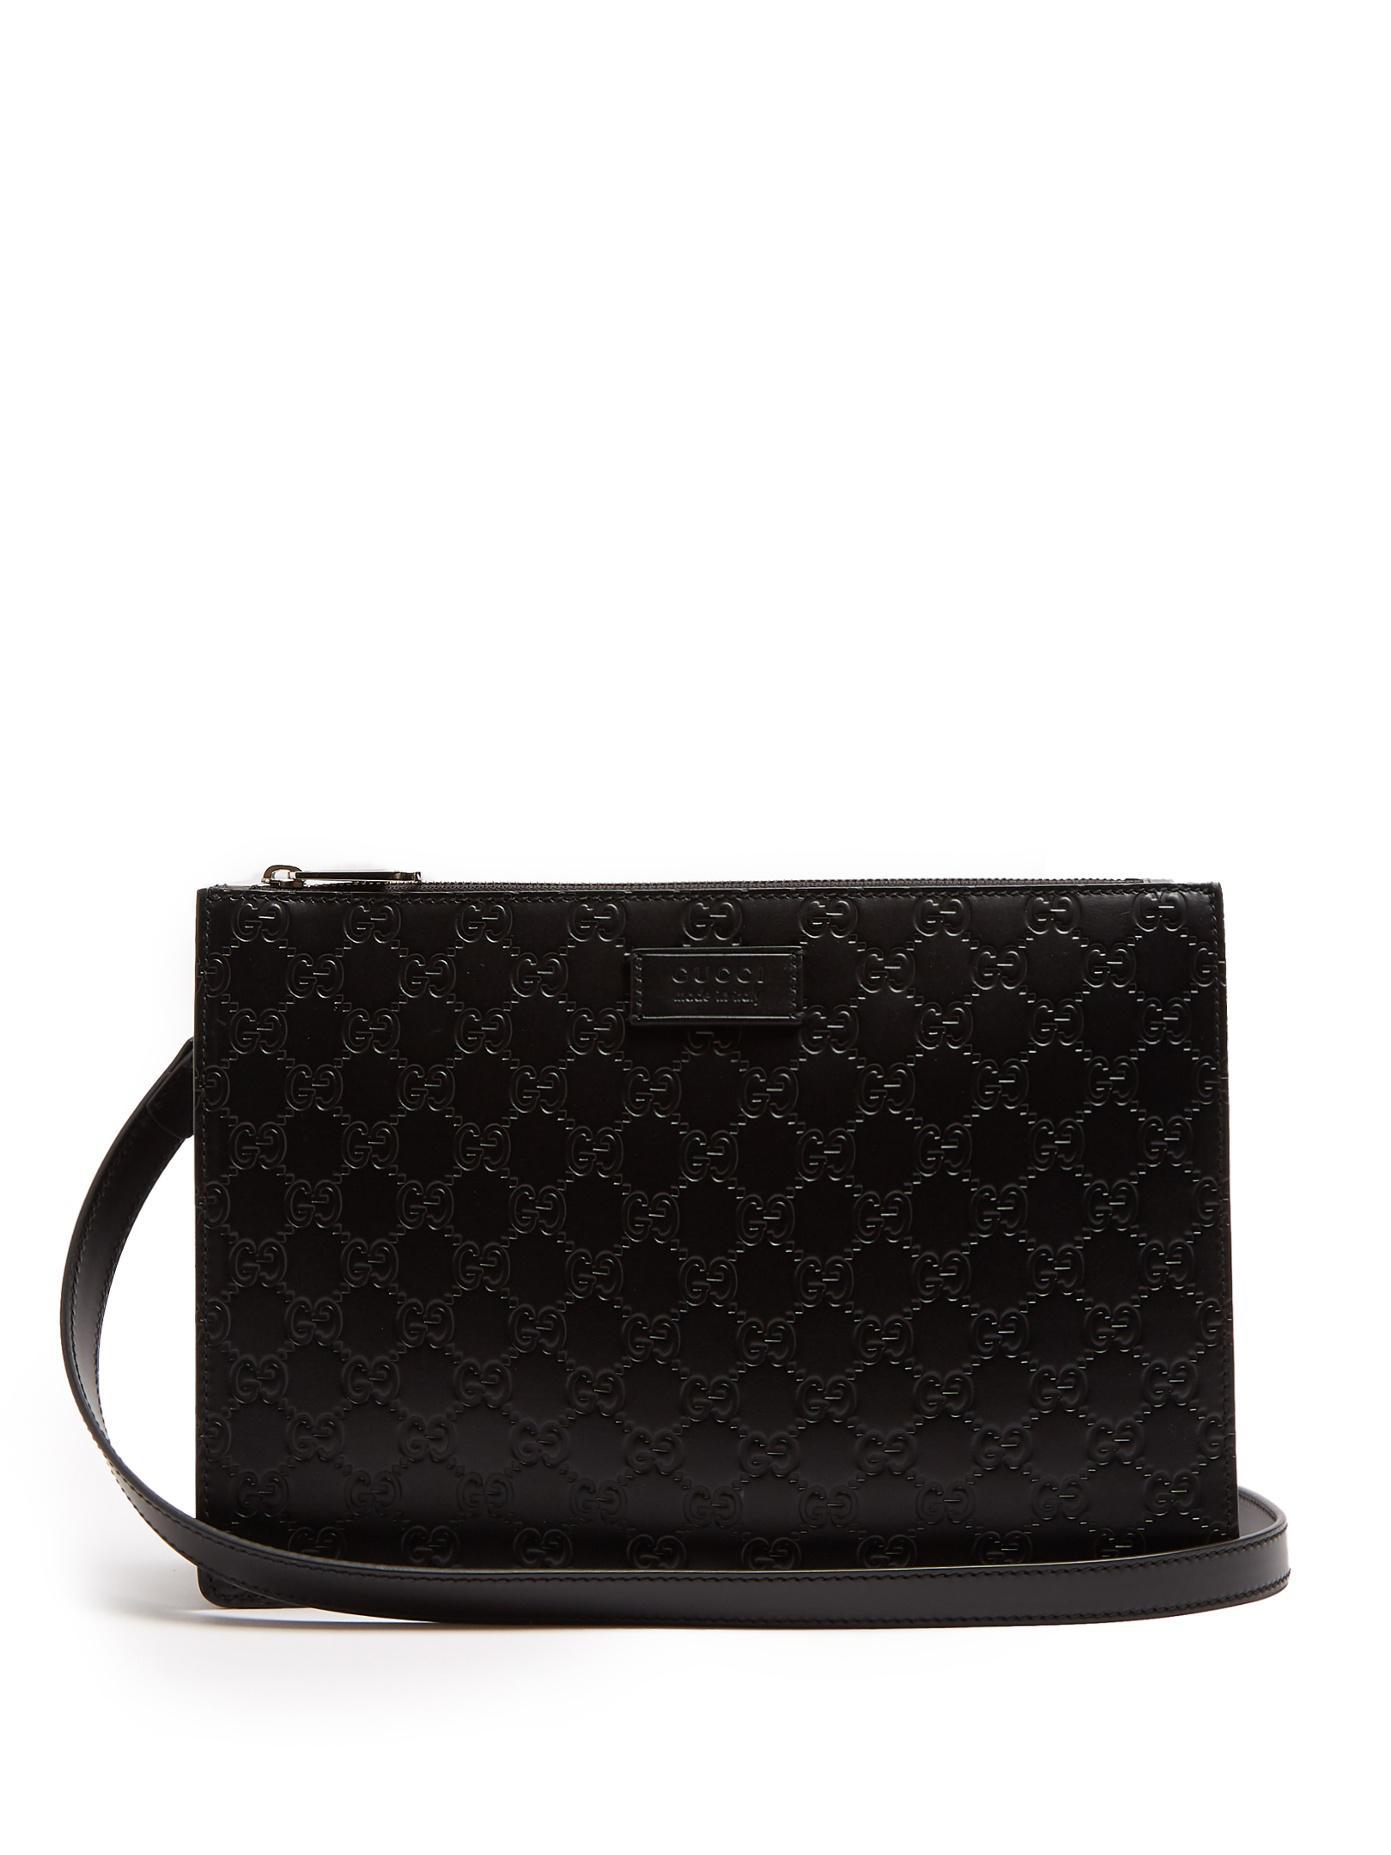 effb7752151 Lyst - Gucci Gg-debossed Leather Cross-body Bag in Black for Men